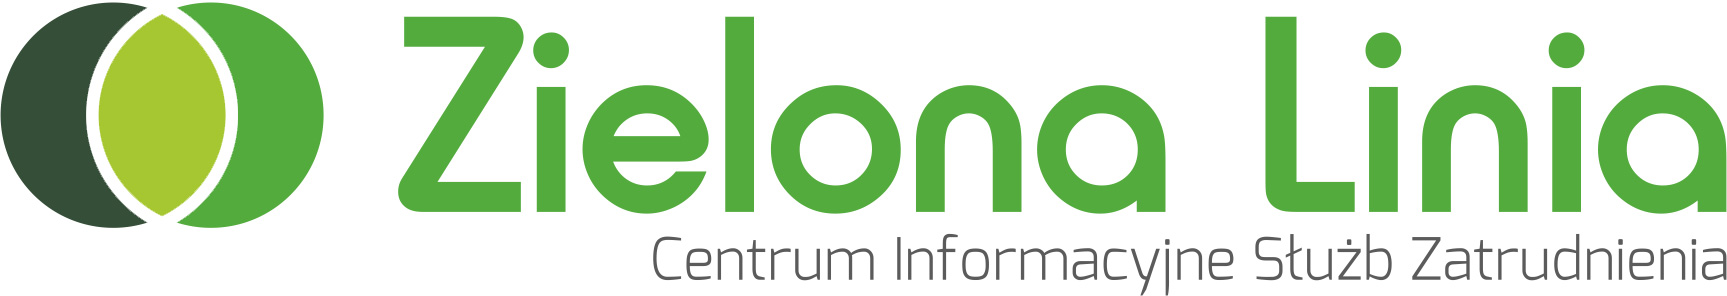 zielonalinia-logo-2013